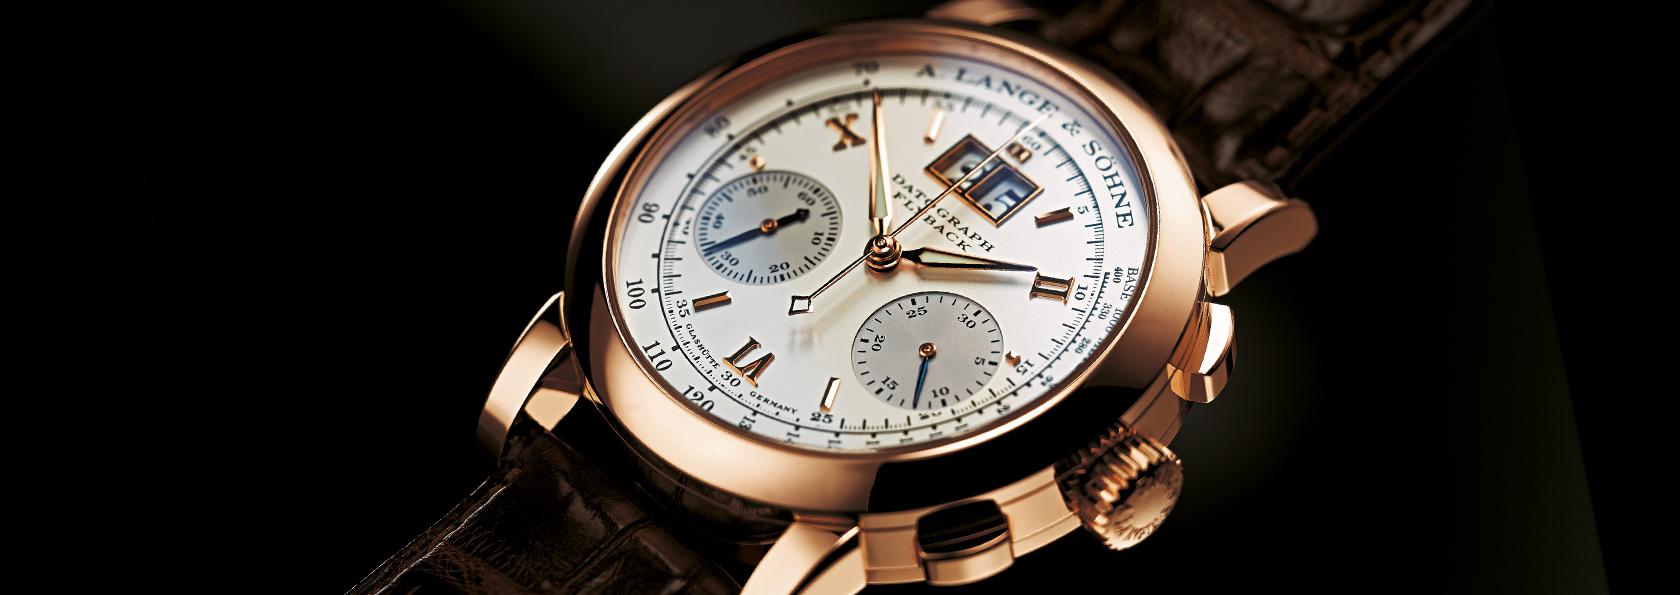 Chronograph-Chronology-ALS-403-032